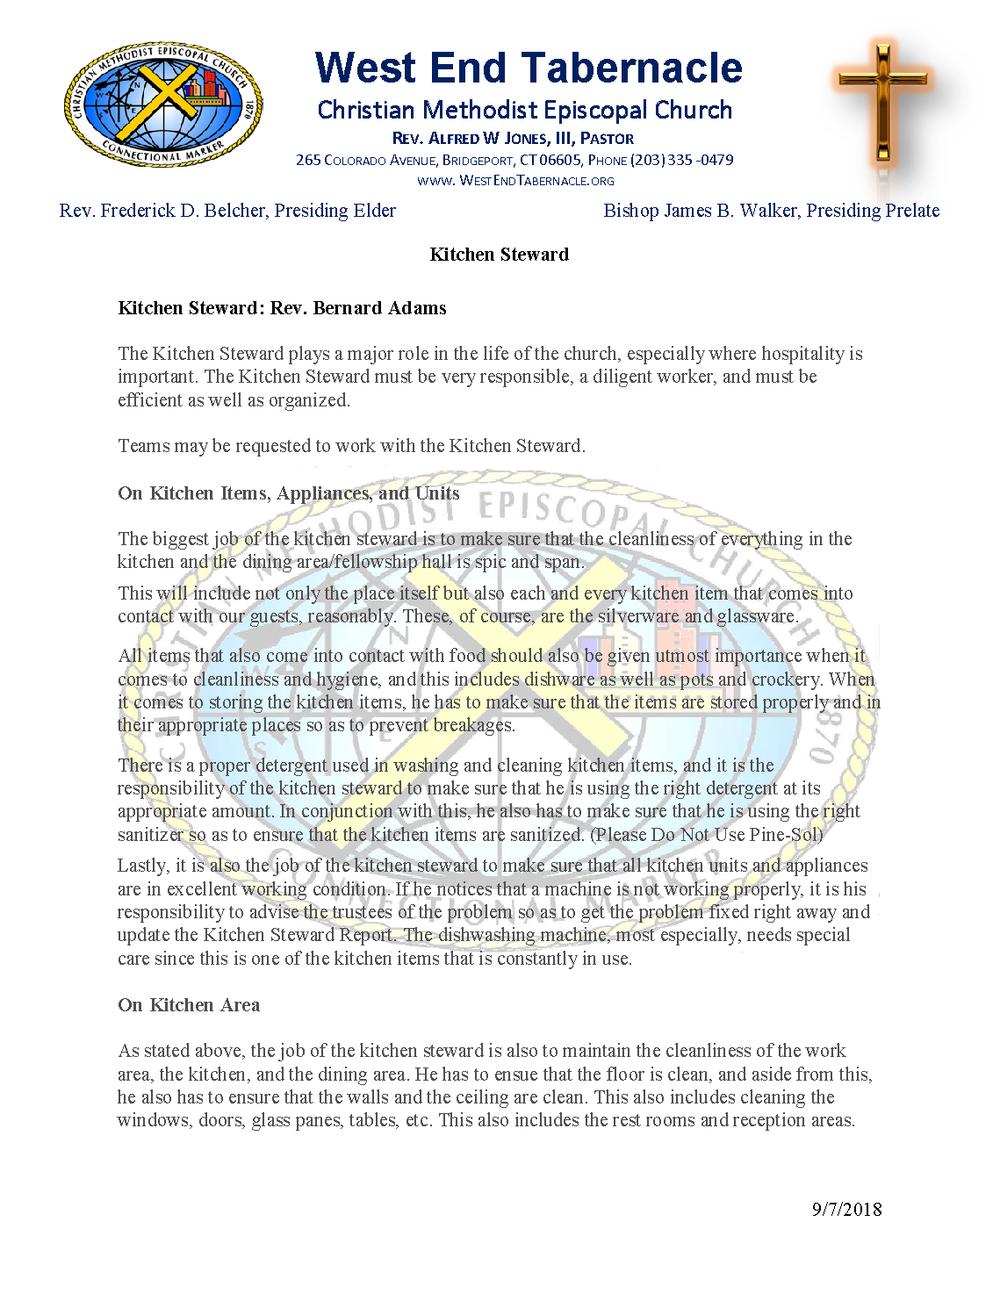 Kitchen Steward Summary_Page_1.png